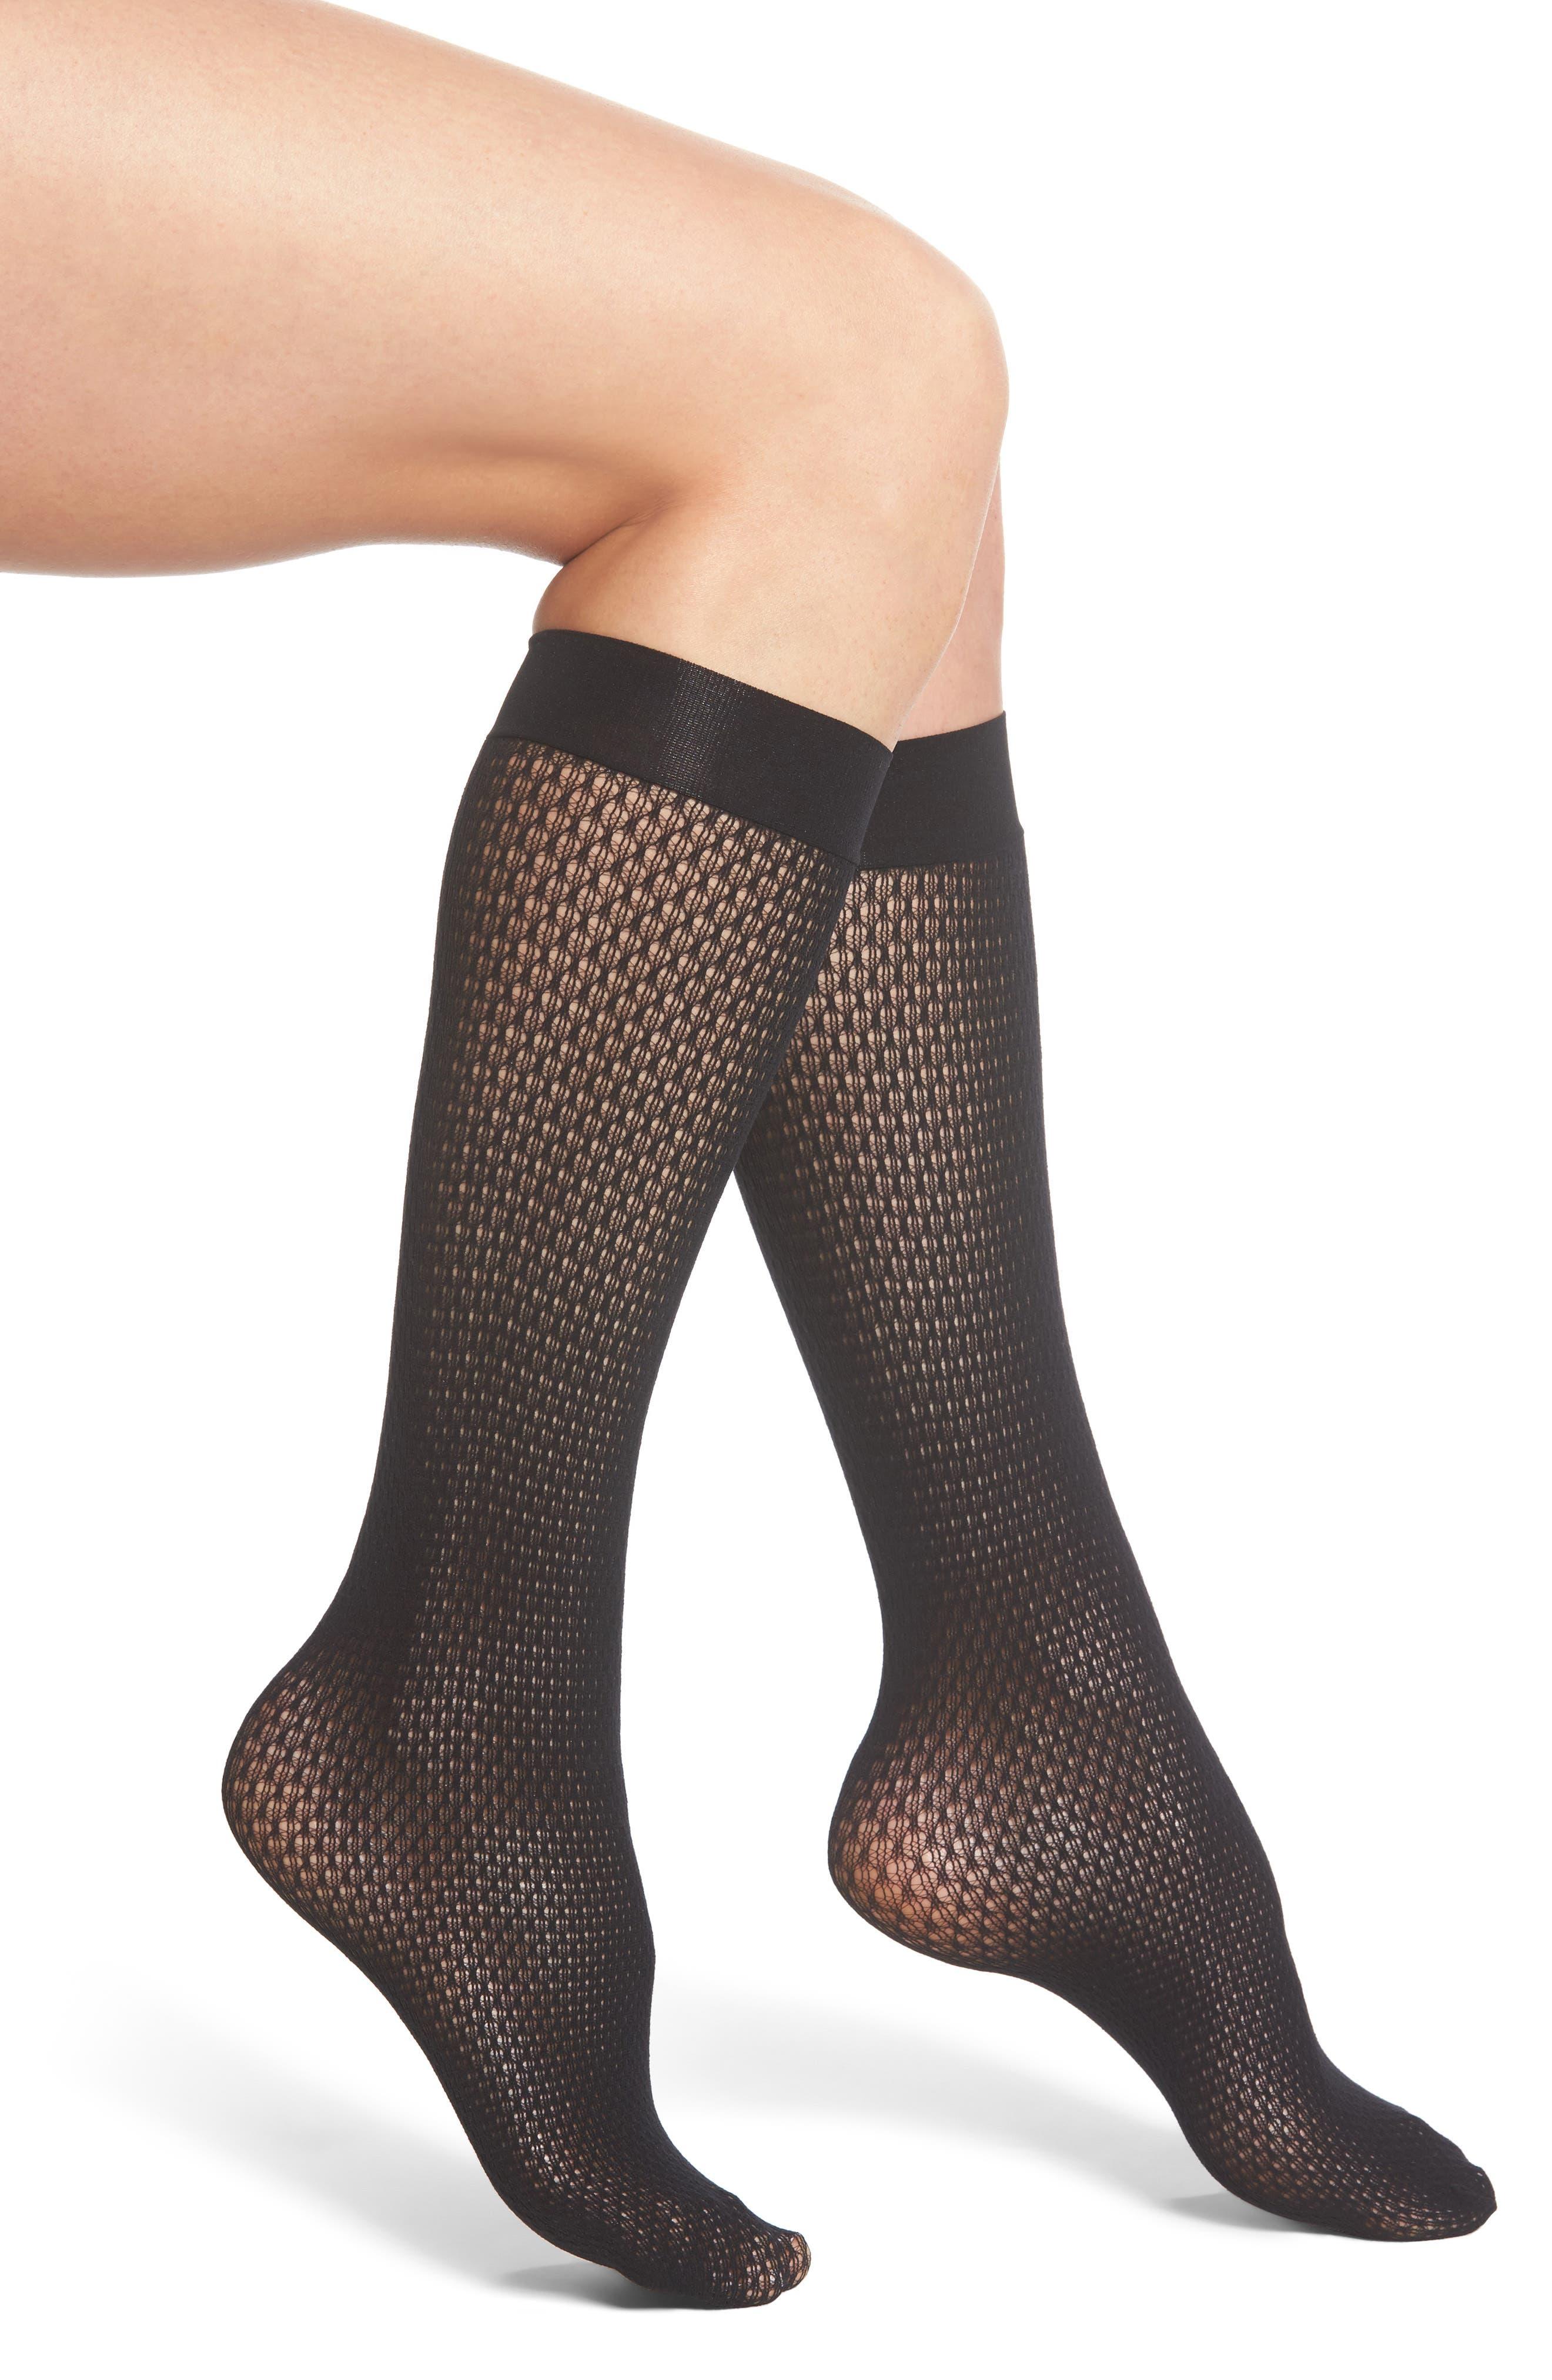 Main Image - Wolford Rhomb Net Knee High Stockings